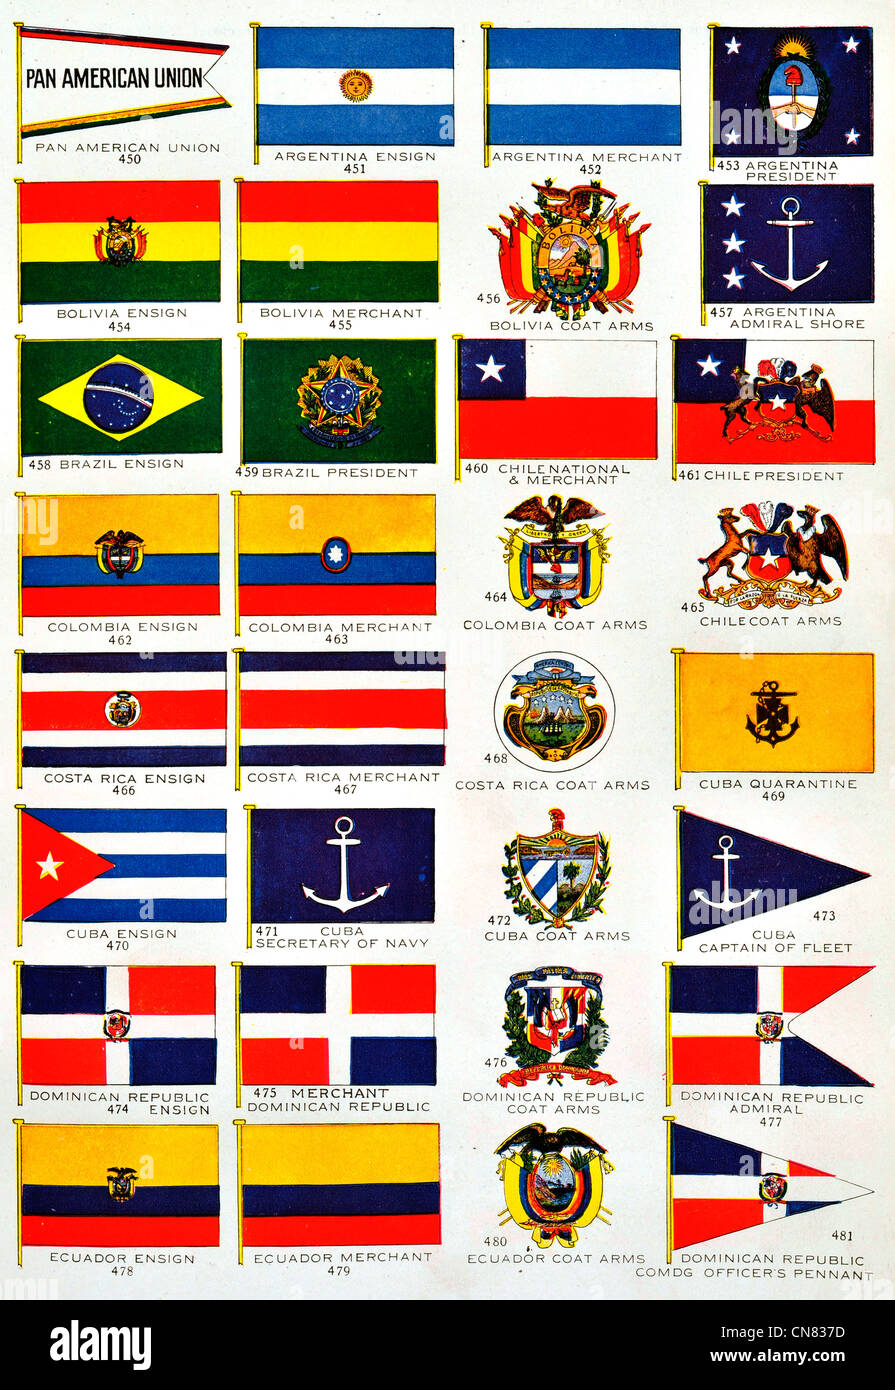 Flags Flag Pan American Union Argentina Bolivia Brazil Columbia Chile Costa  Rica Cuba Dominican Republic Ecuador c752aee3278